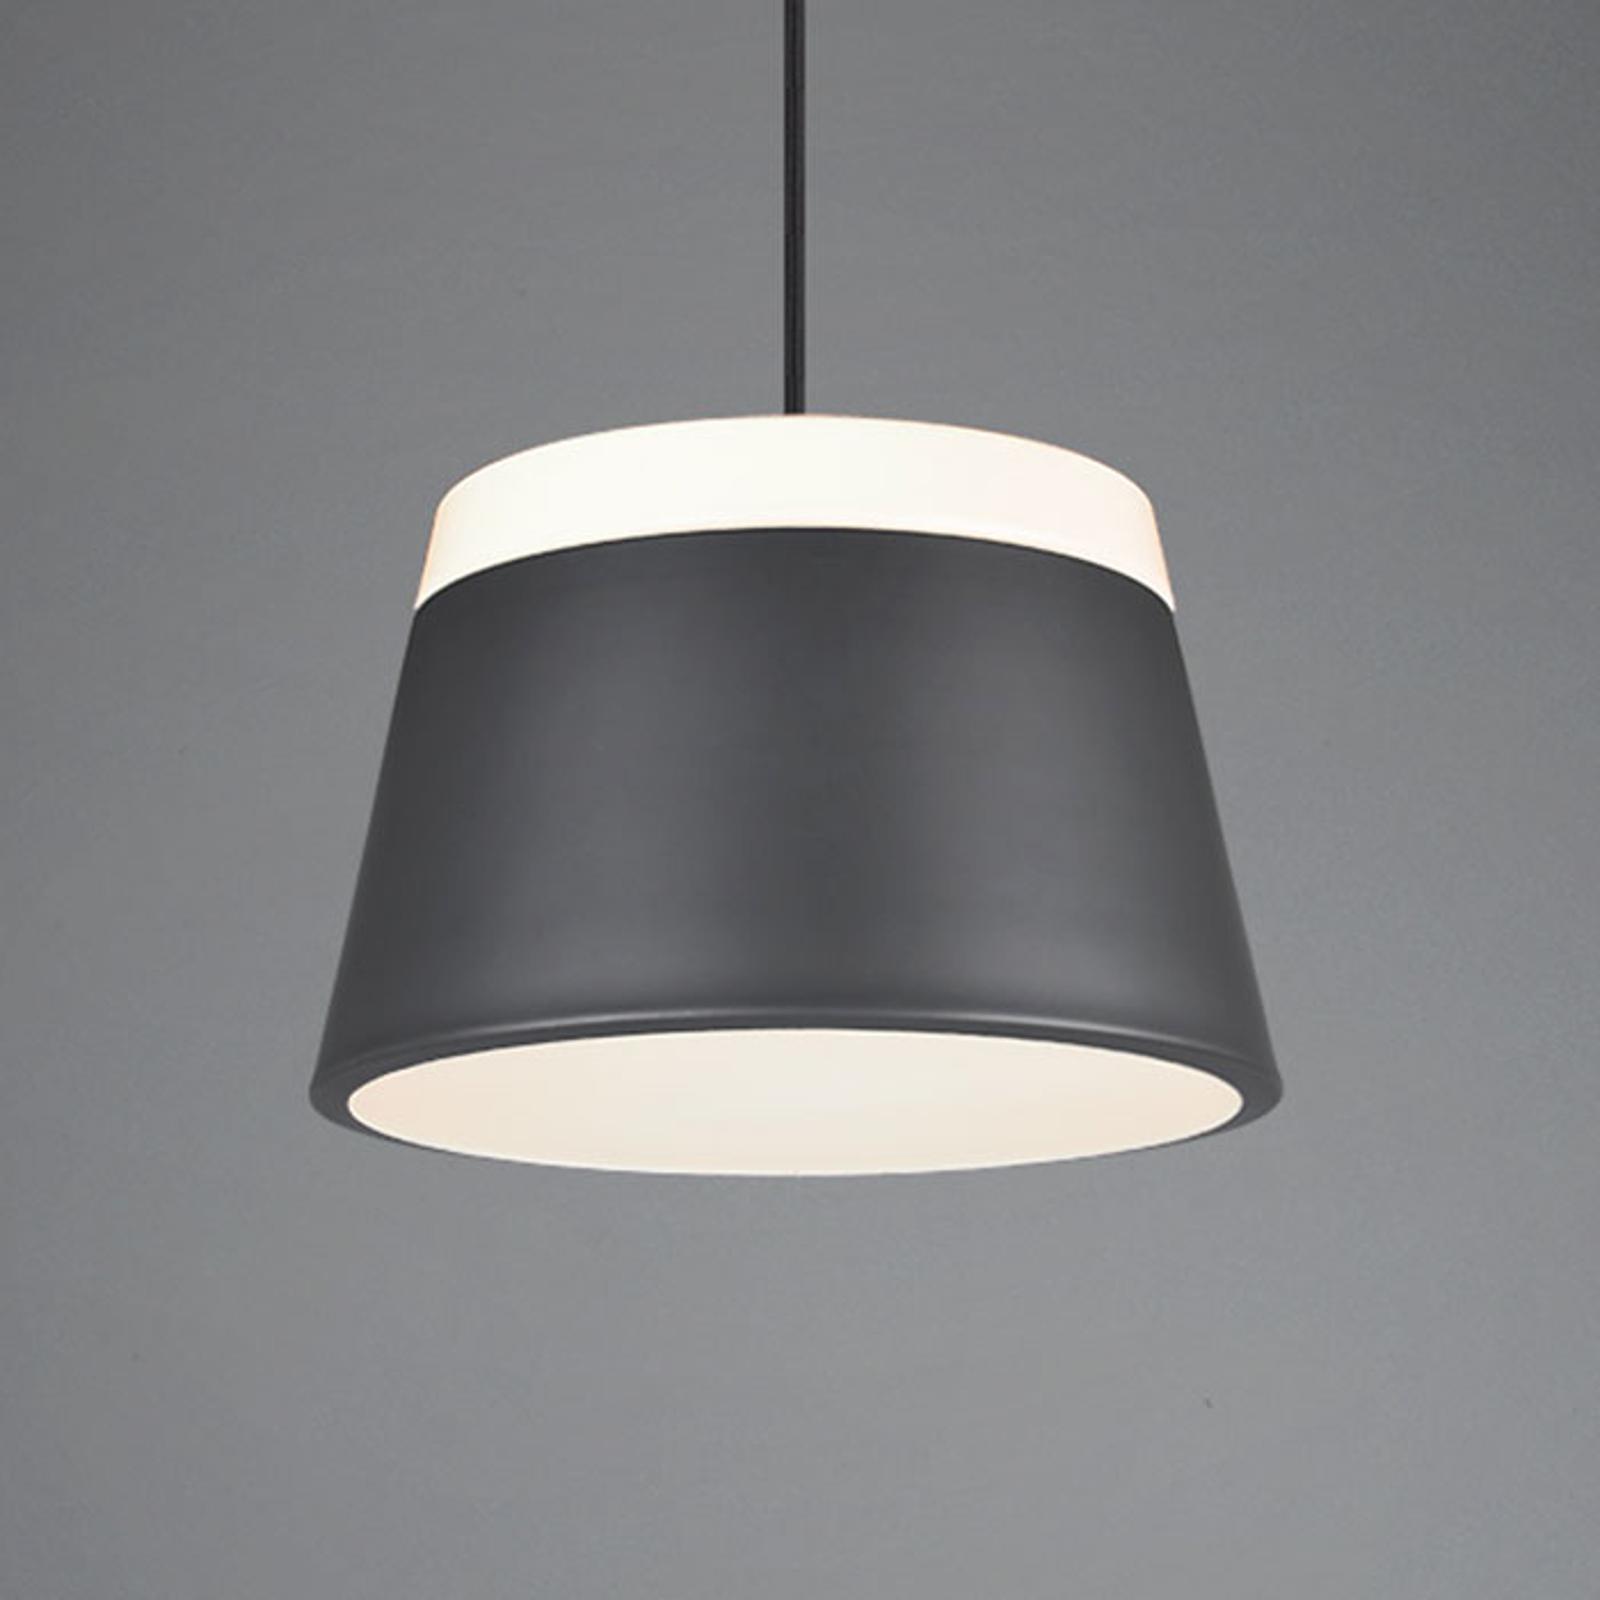 Hanglamp Baroness Ø 45 cm, antraciet